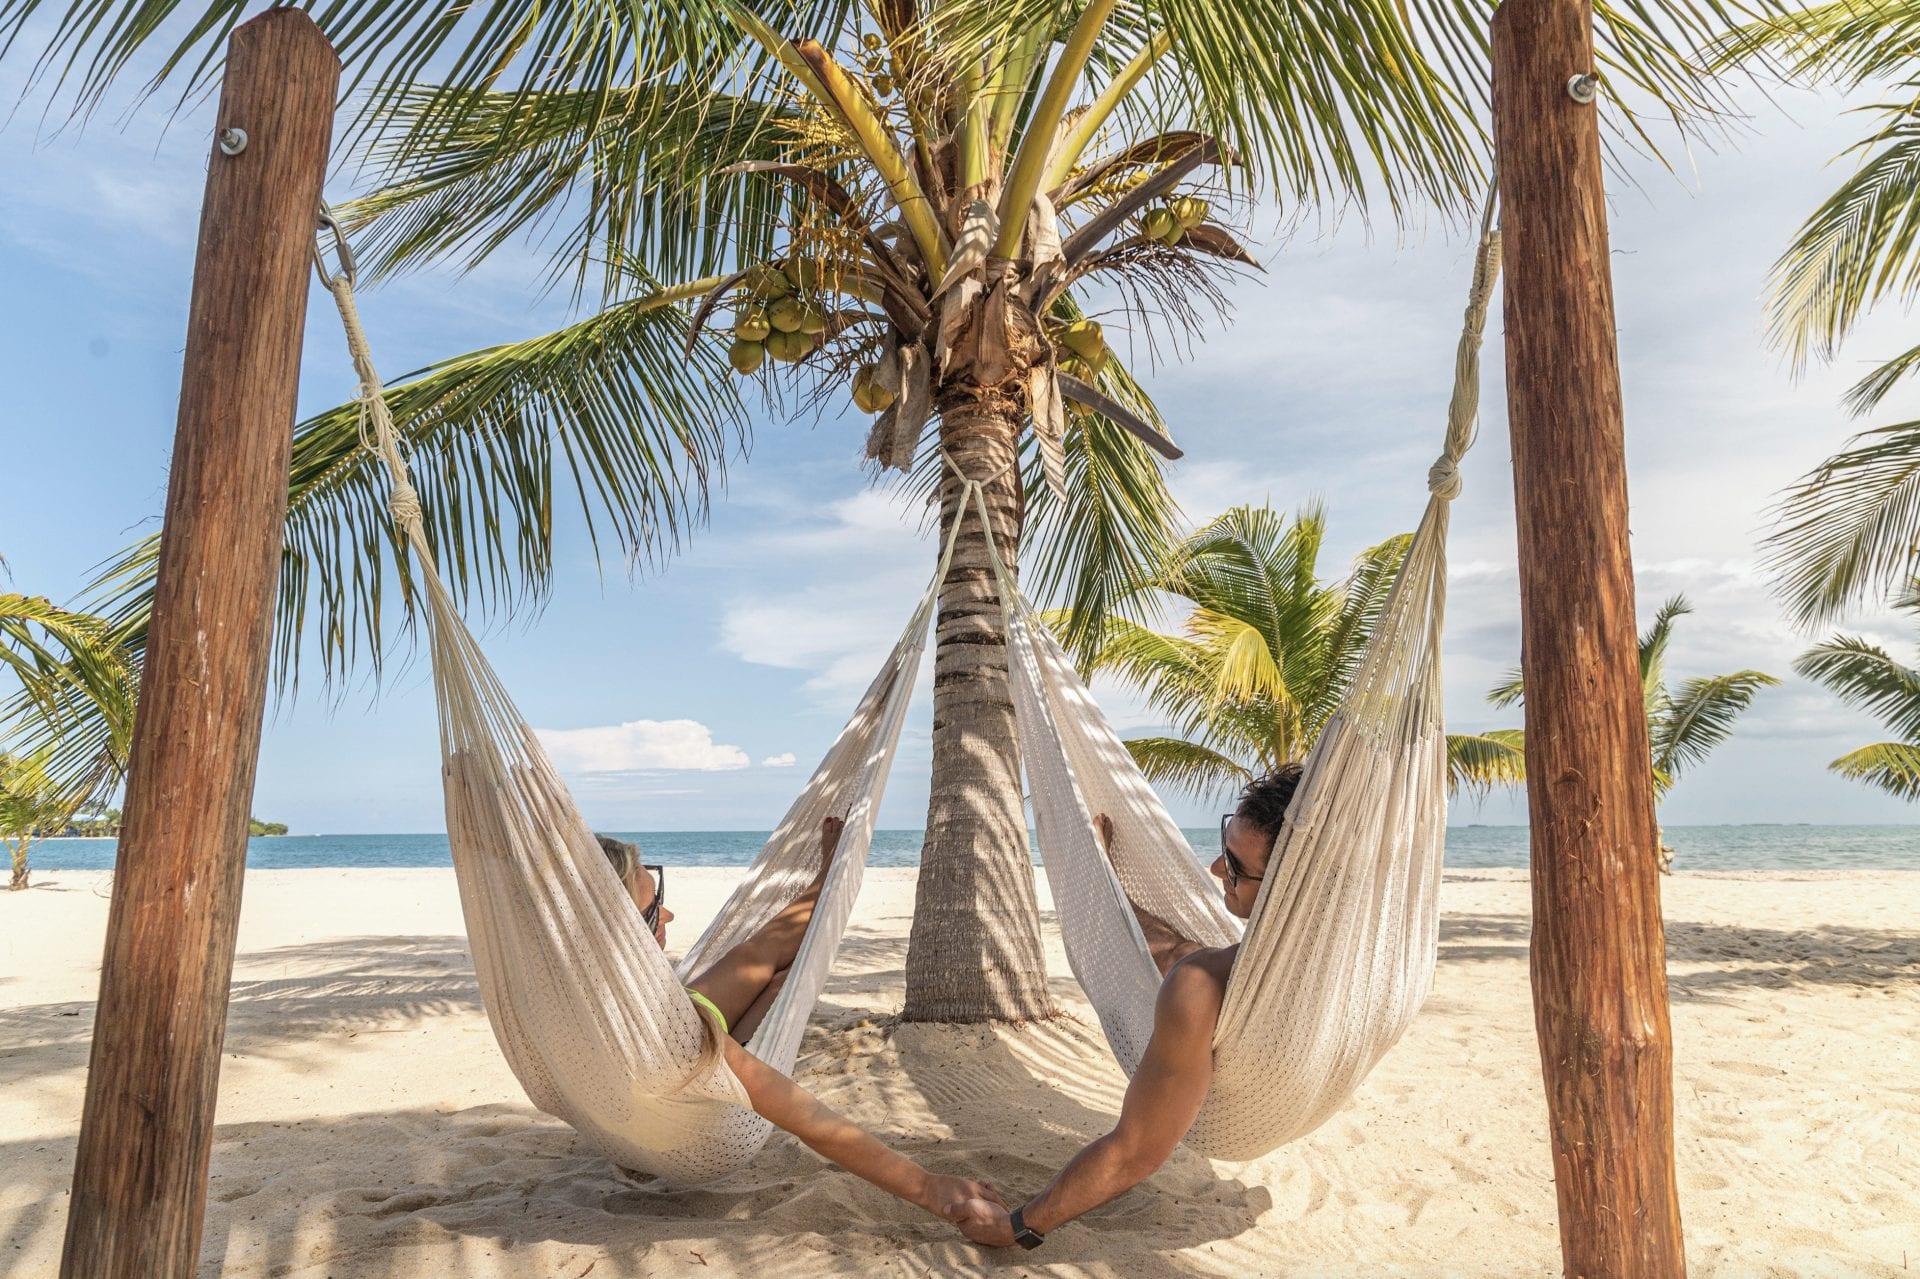 hammock-beach-placencia-couple-winter-denver-belize